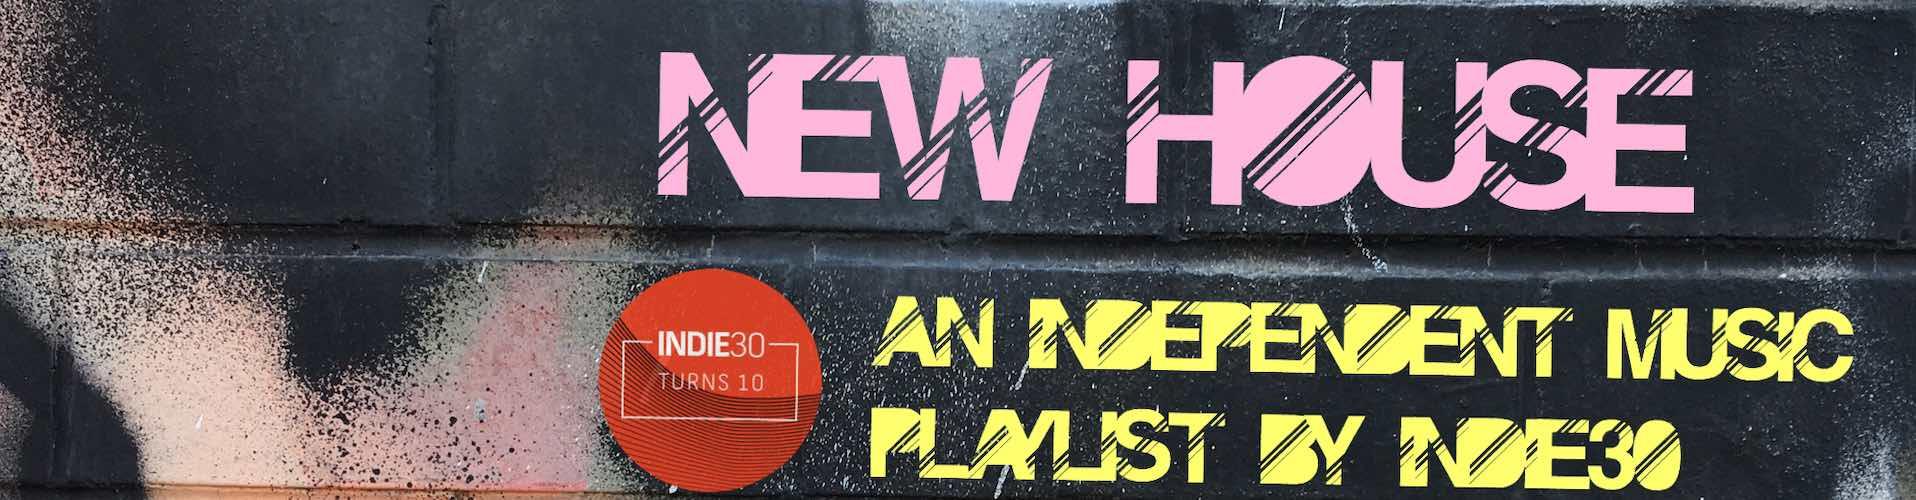 New-House-Playlist-September-banner-copy